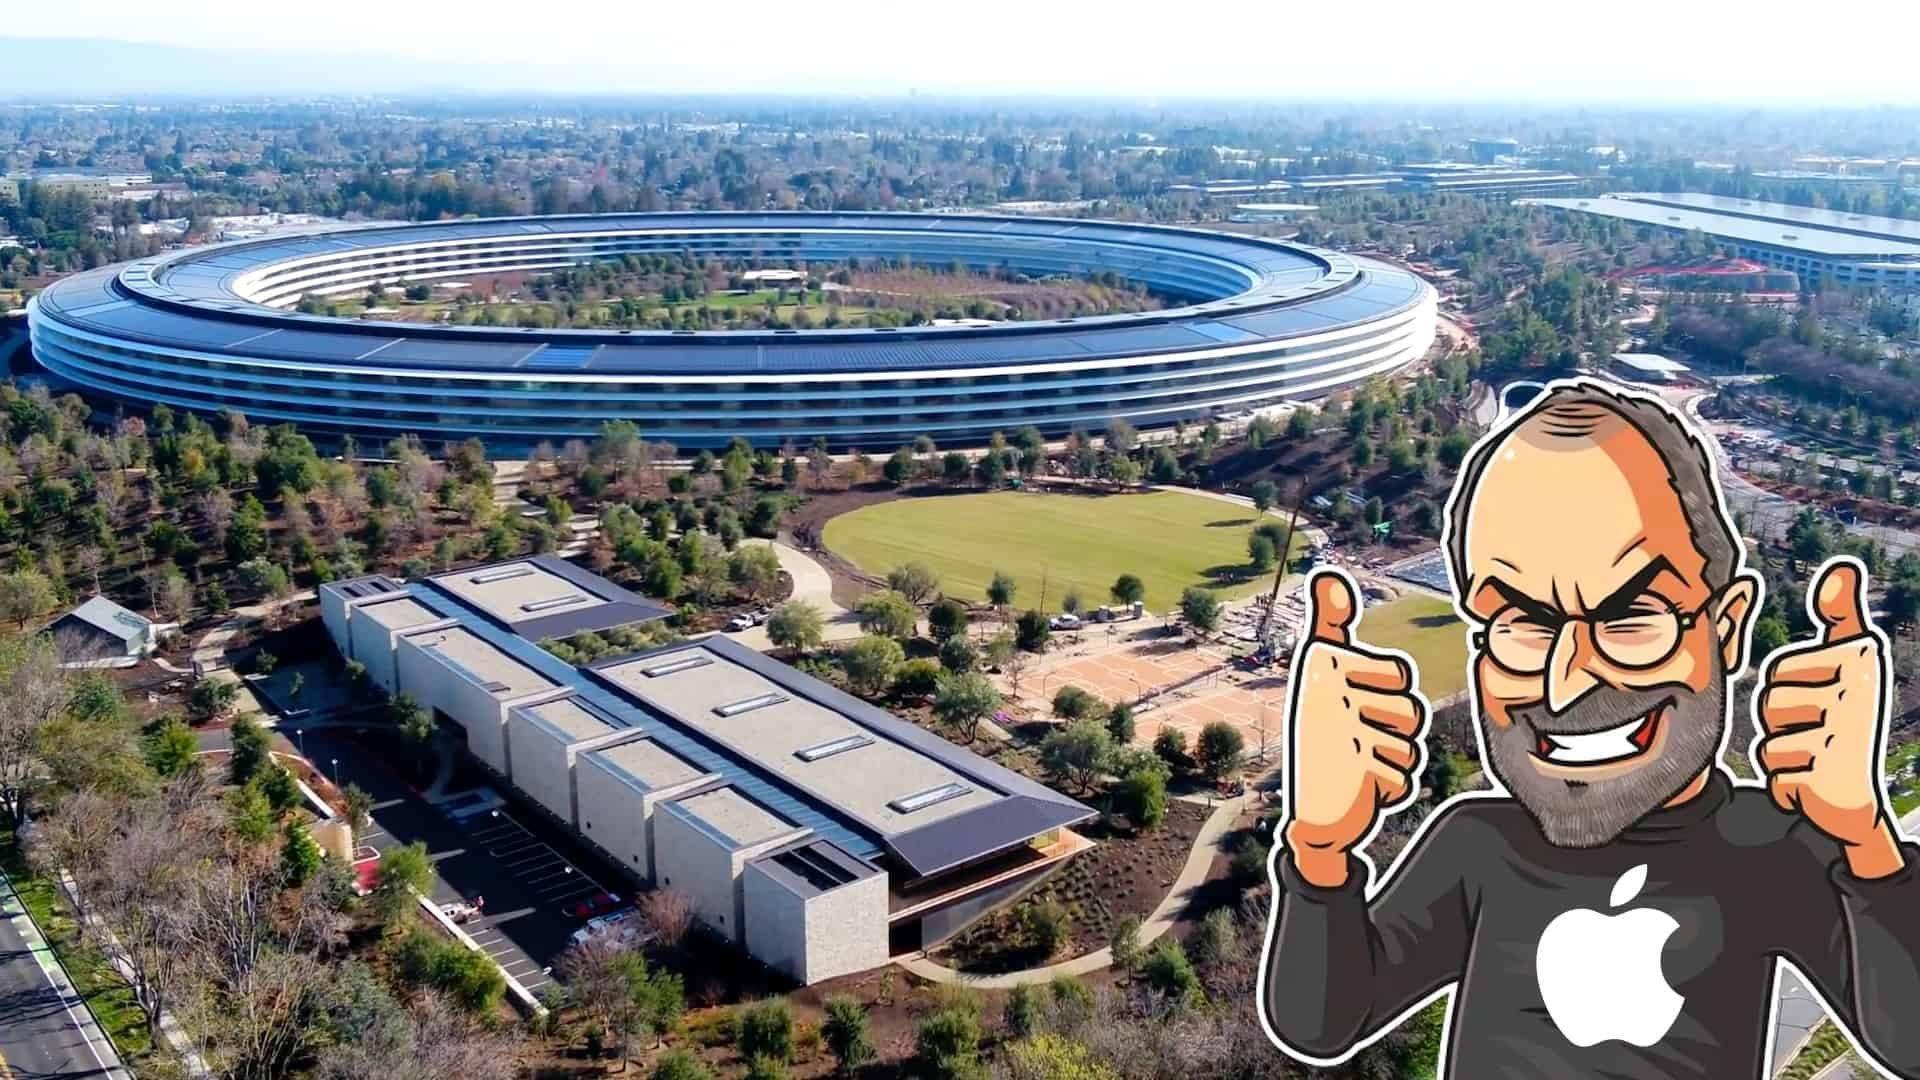 Inside Apple Park New $5 Billion HQ That Would Make Steve Jobs Proud!